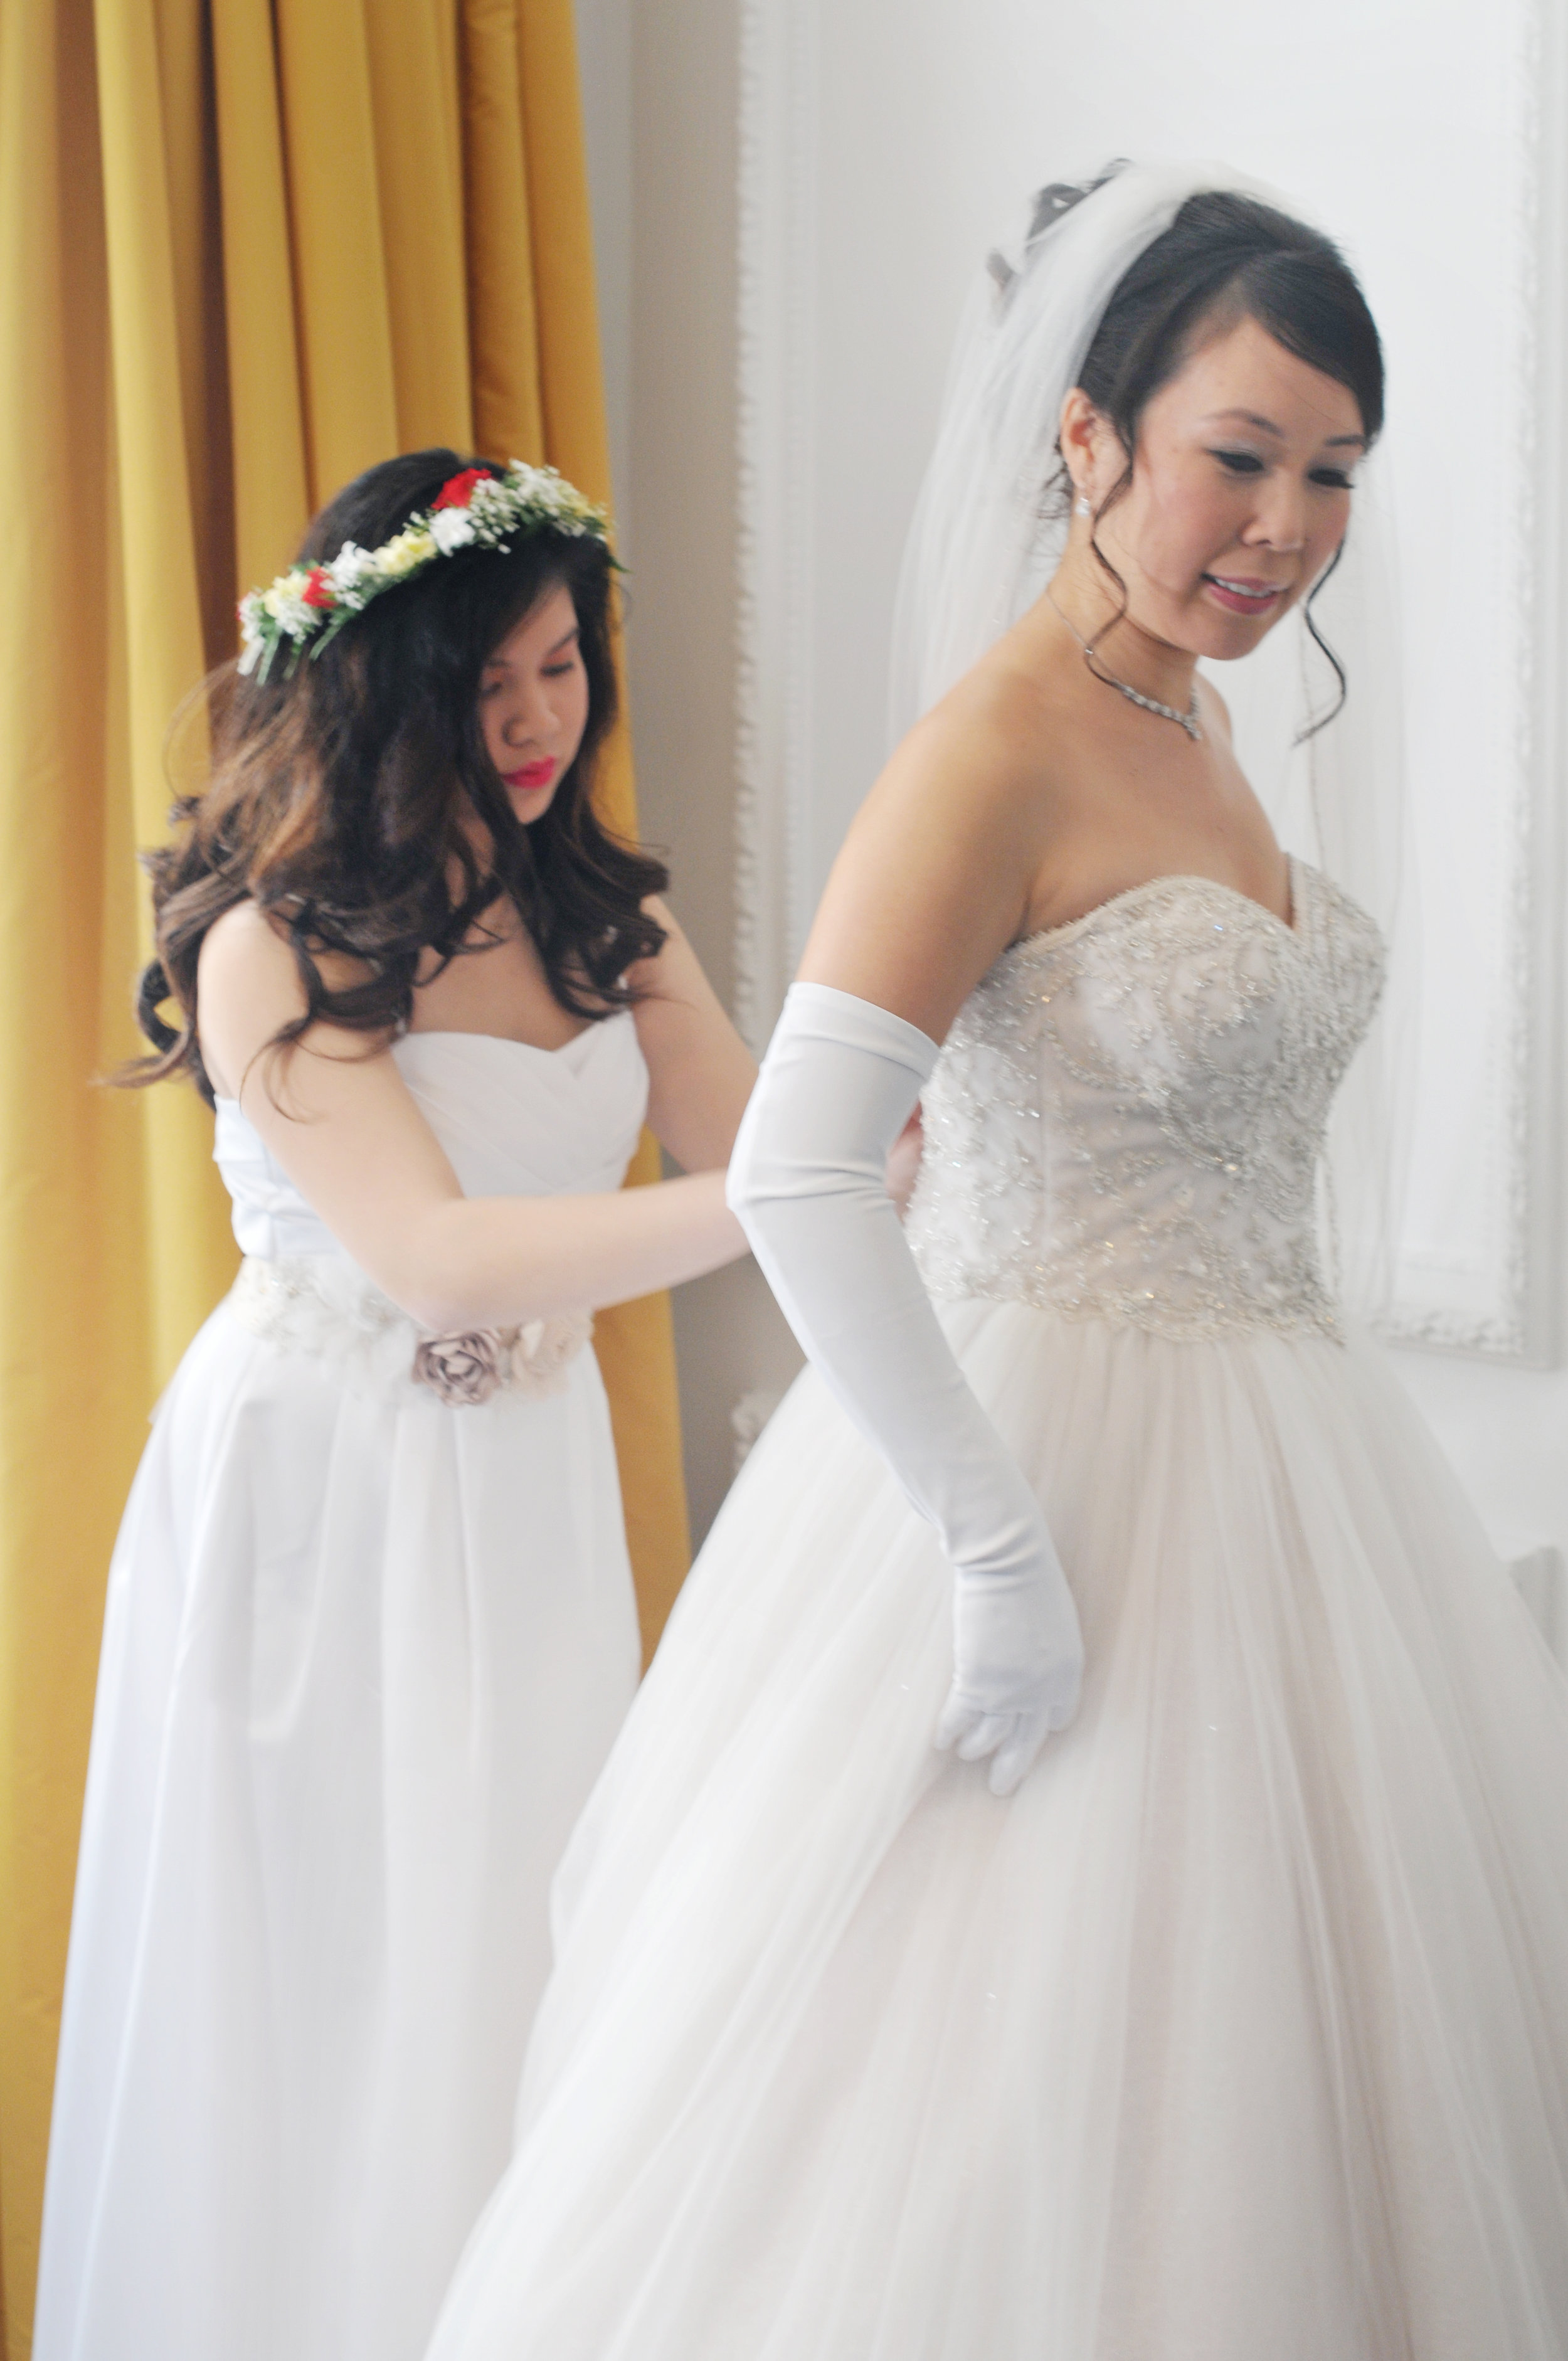 Partovi Wedding 2139 by maria pablo.jpg